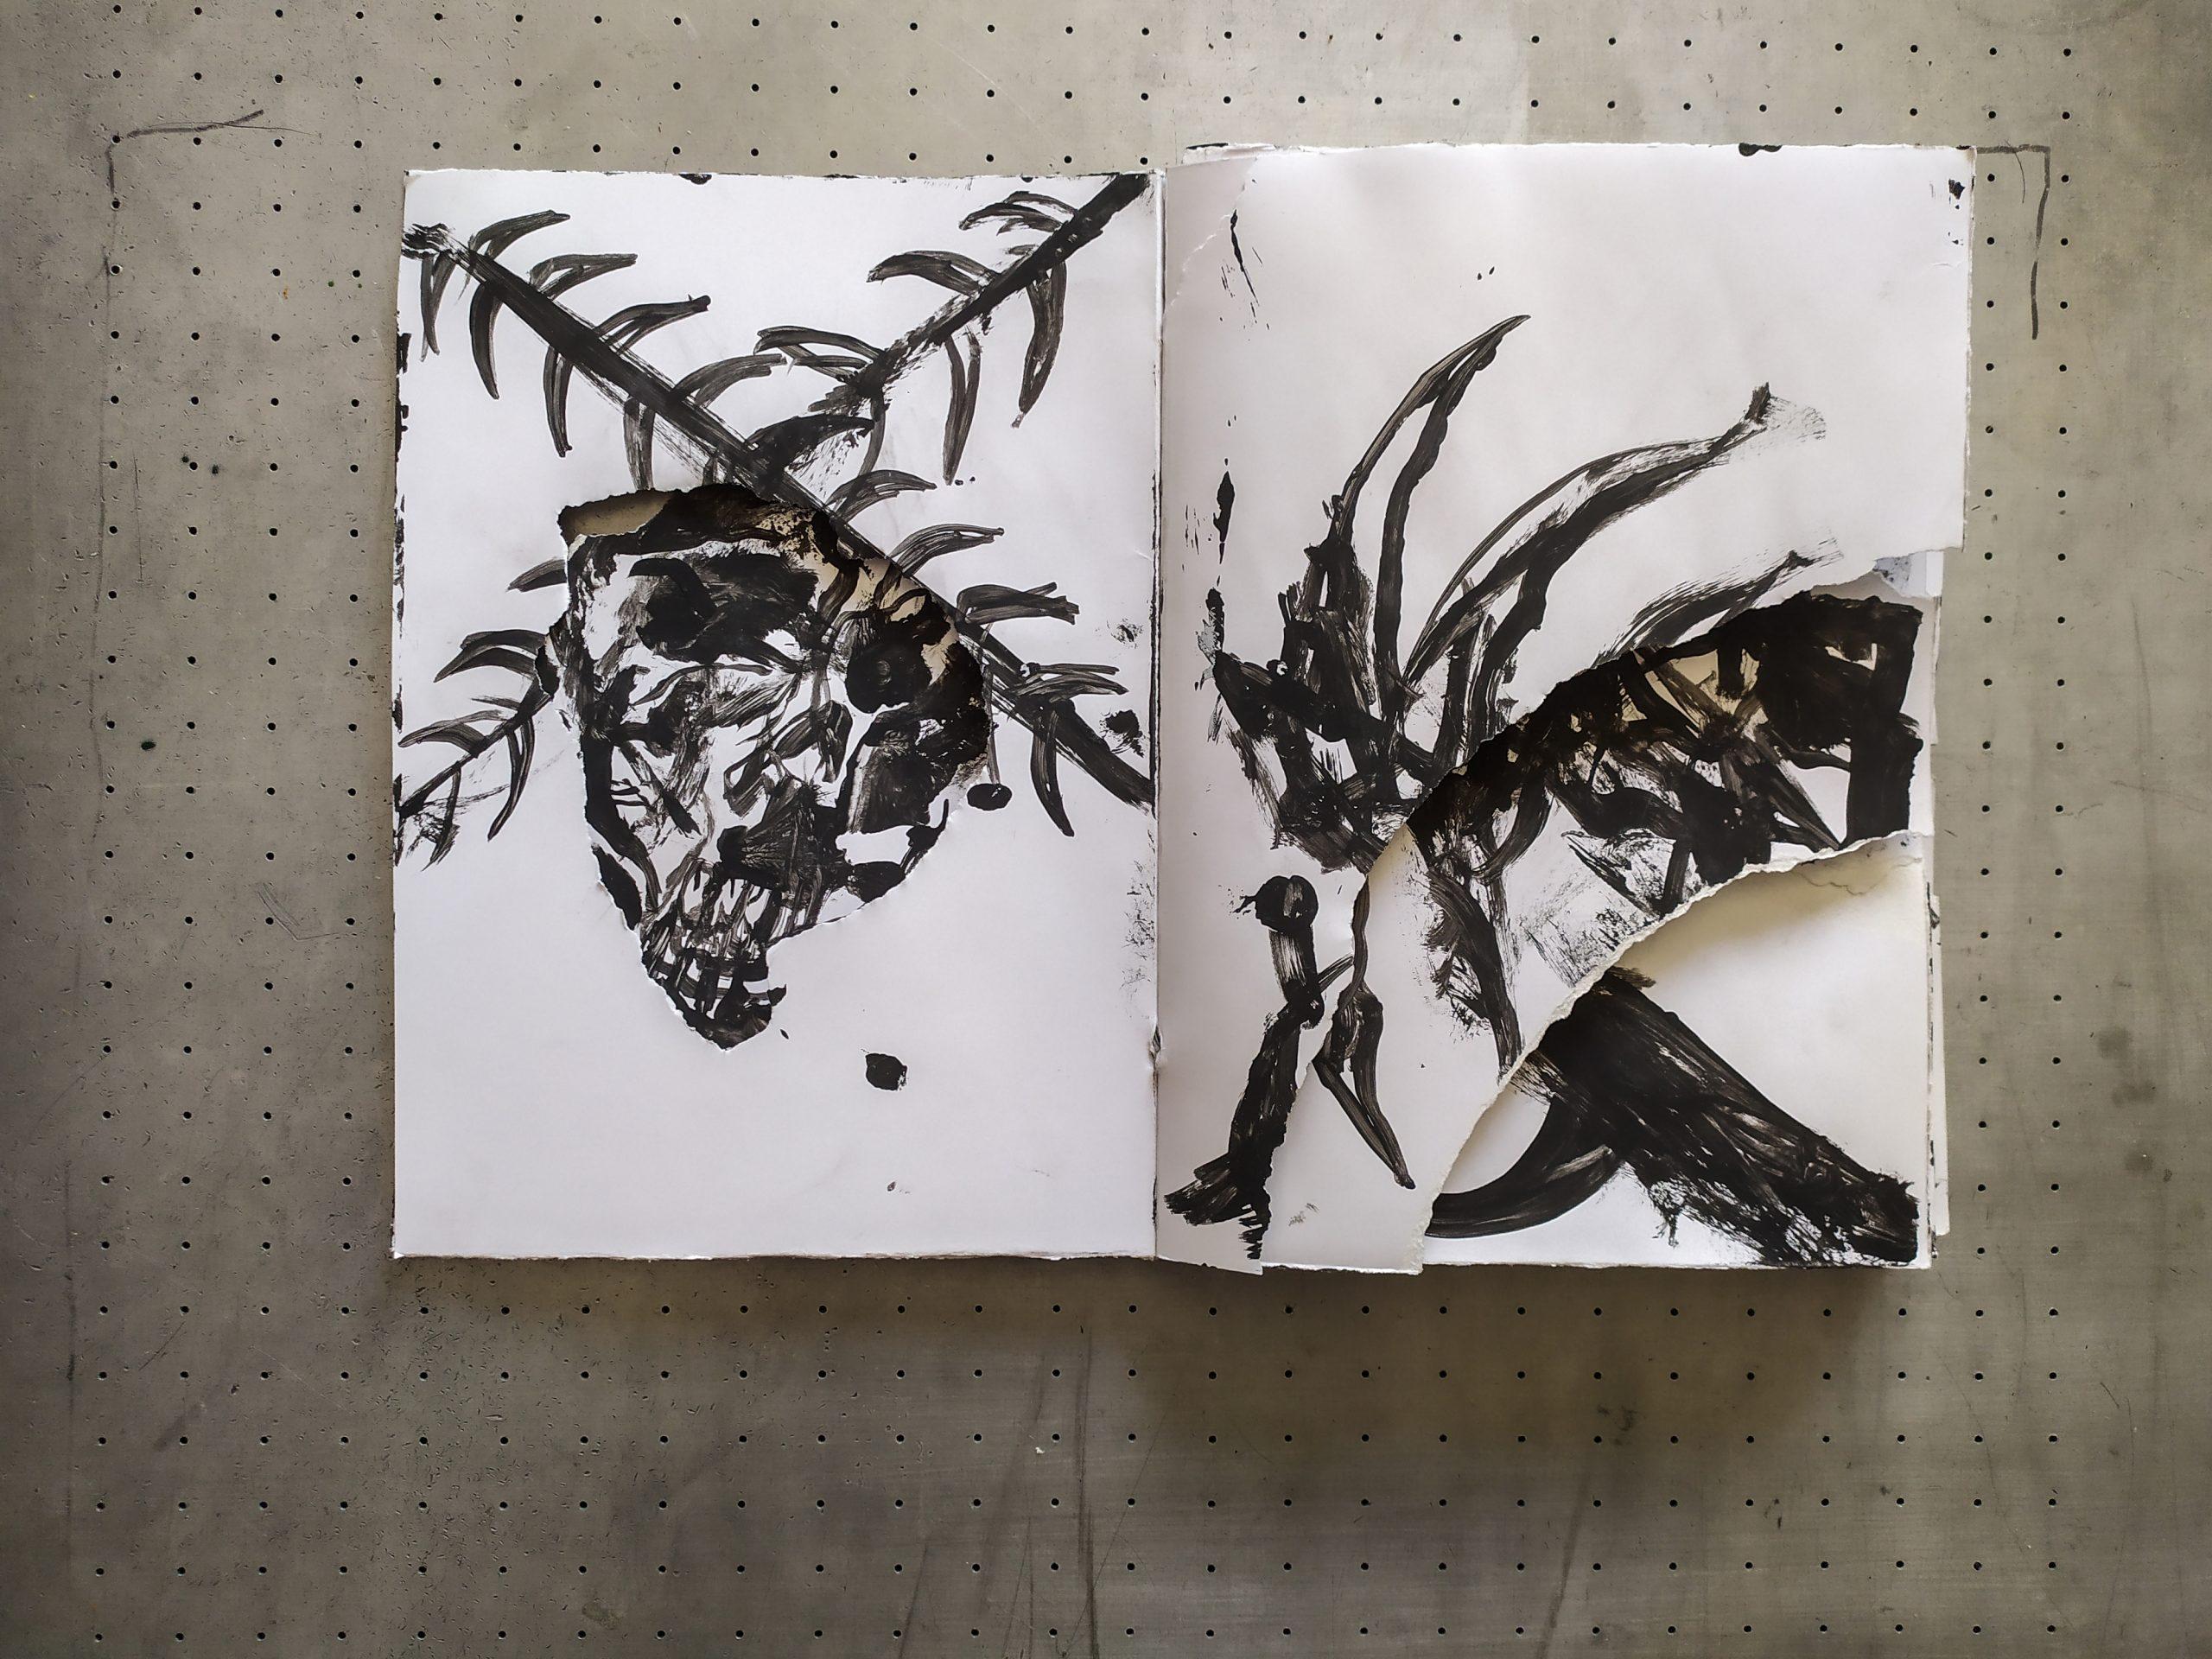 artistbook-sep-2021-carloszorromono-5